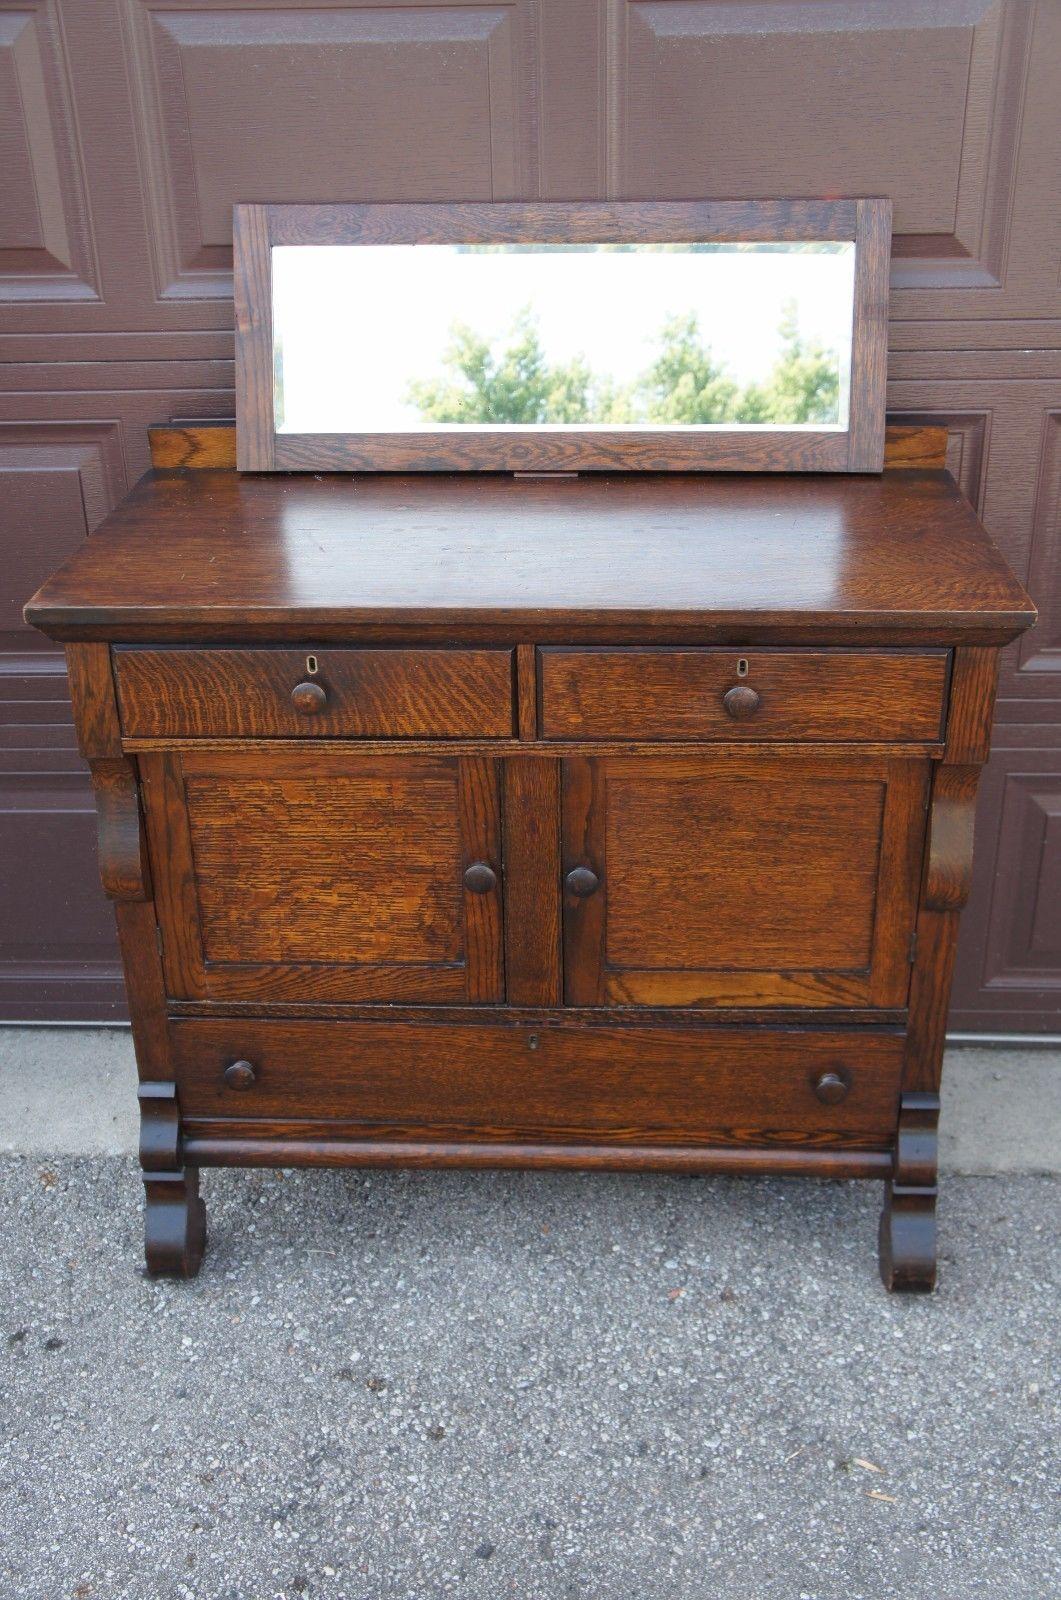 Antique arts and crafts furniture - Antique Arts Crafts Tiger Oak Mirror Top Buffet Sideboard Server Cabinet Dry Bar Ebay